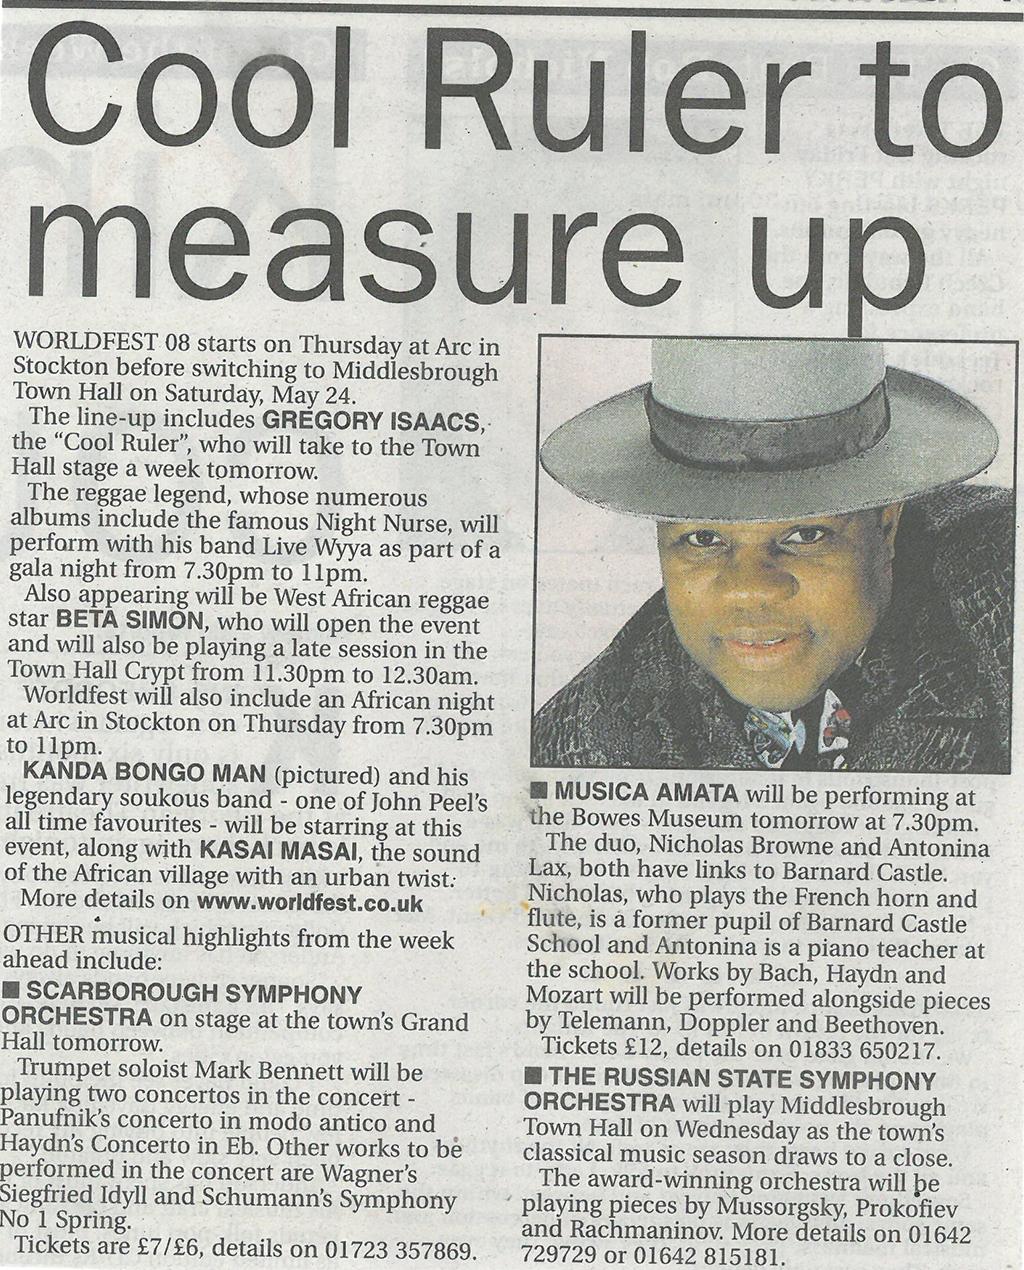 2008-05-16, Evening Gazette (2)